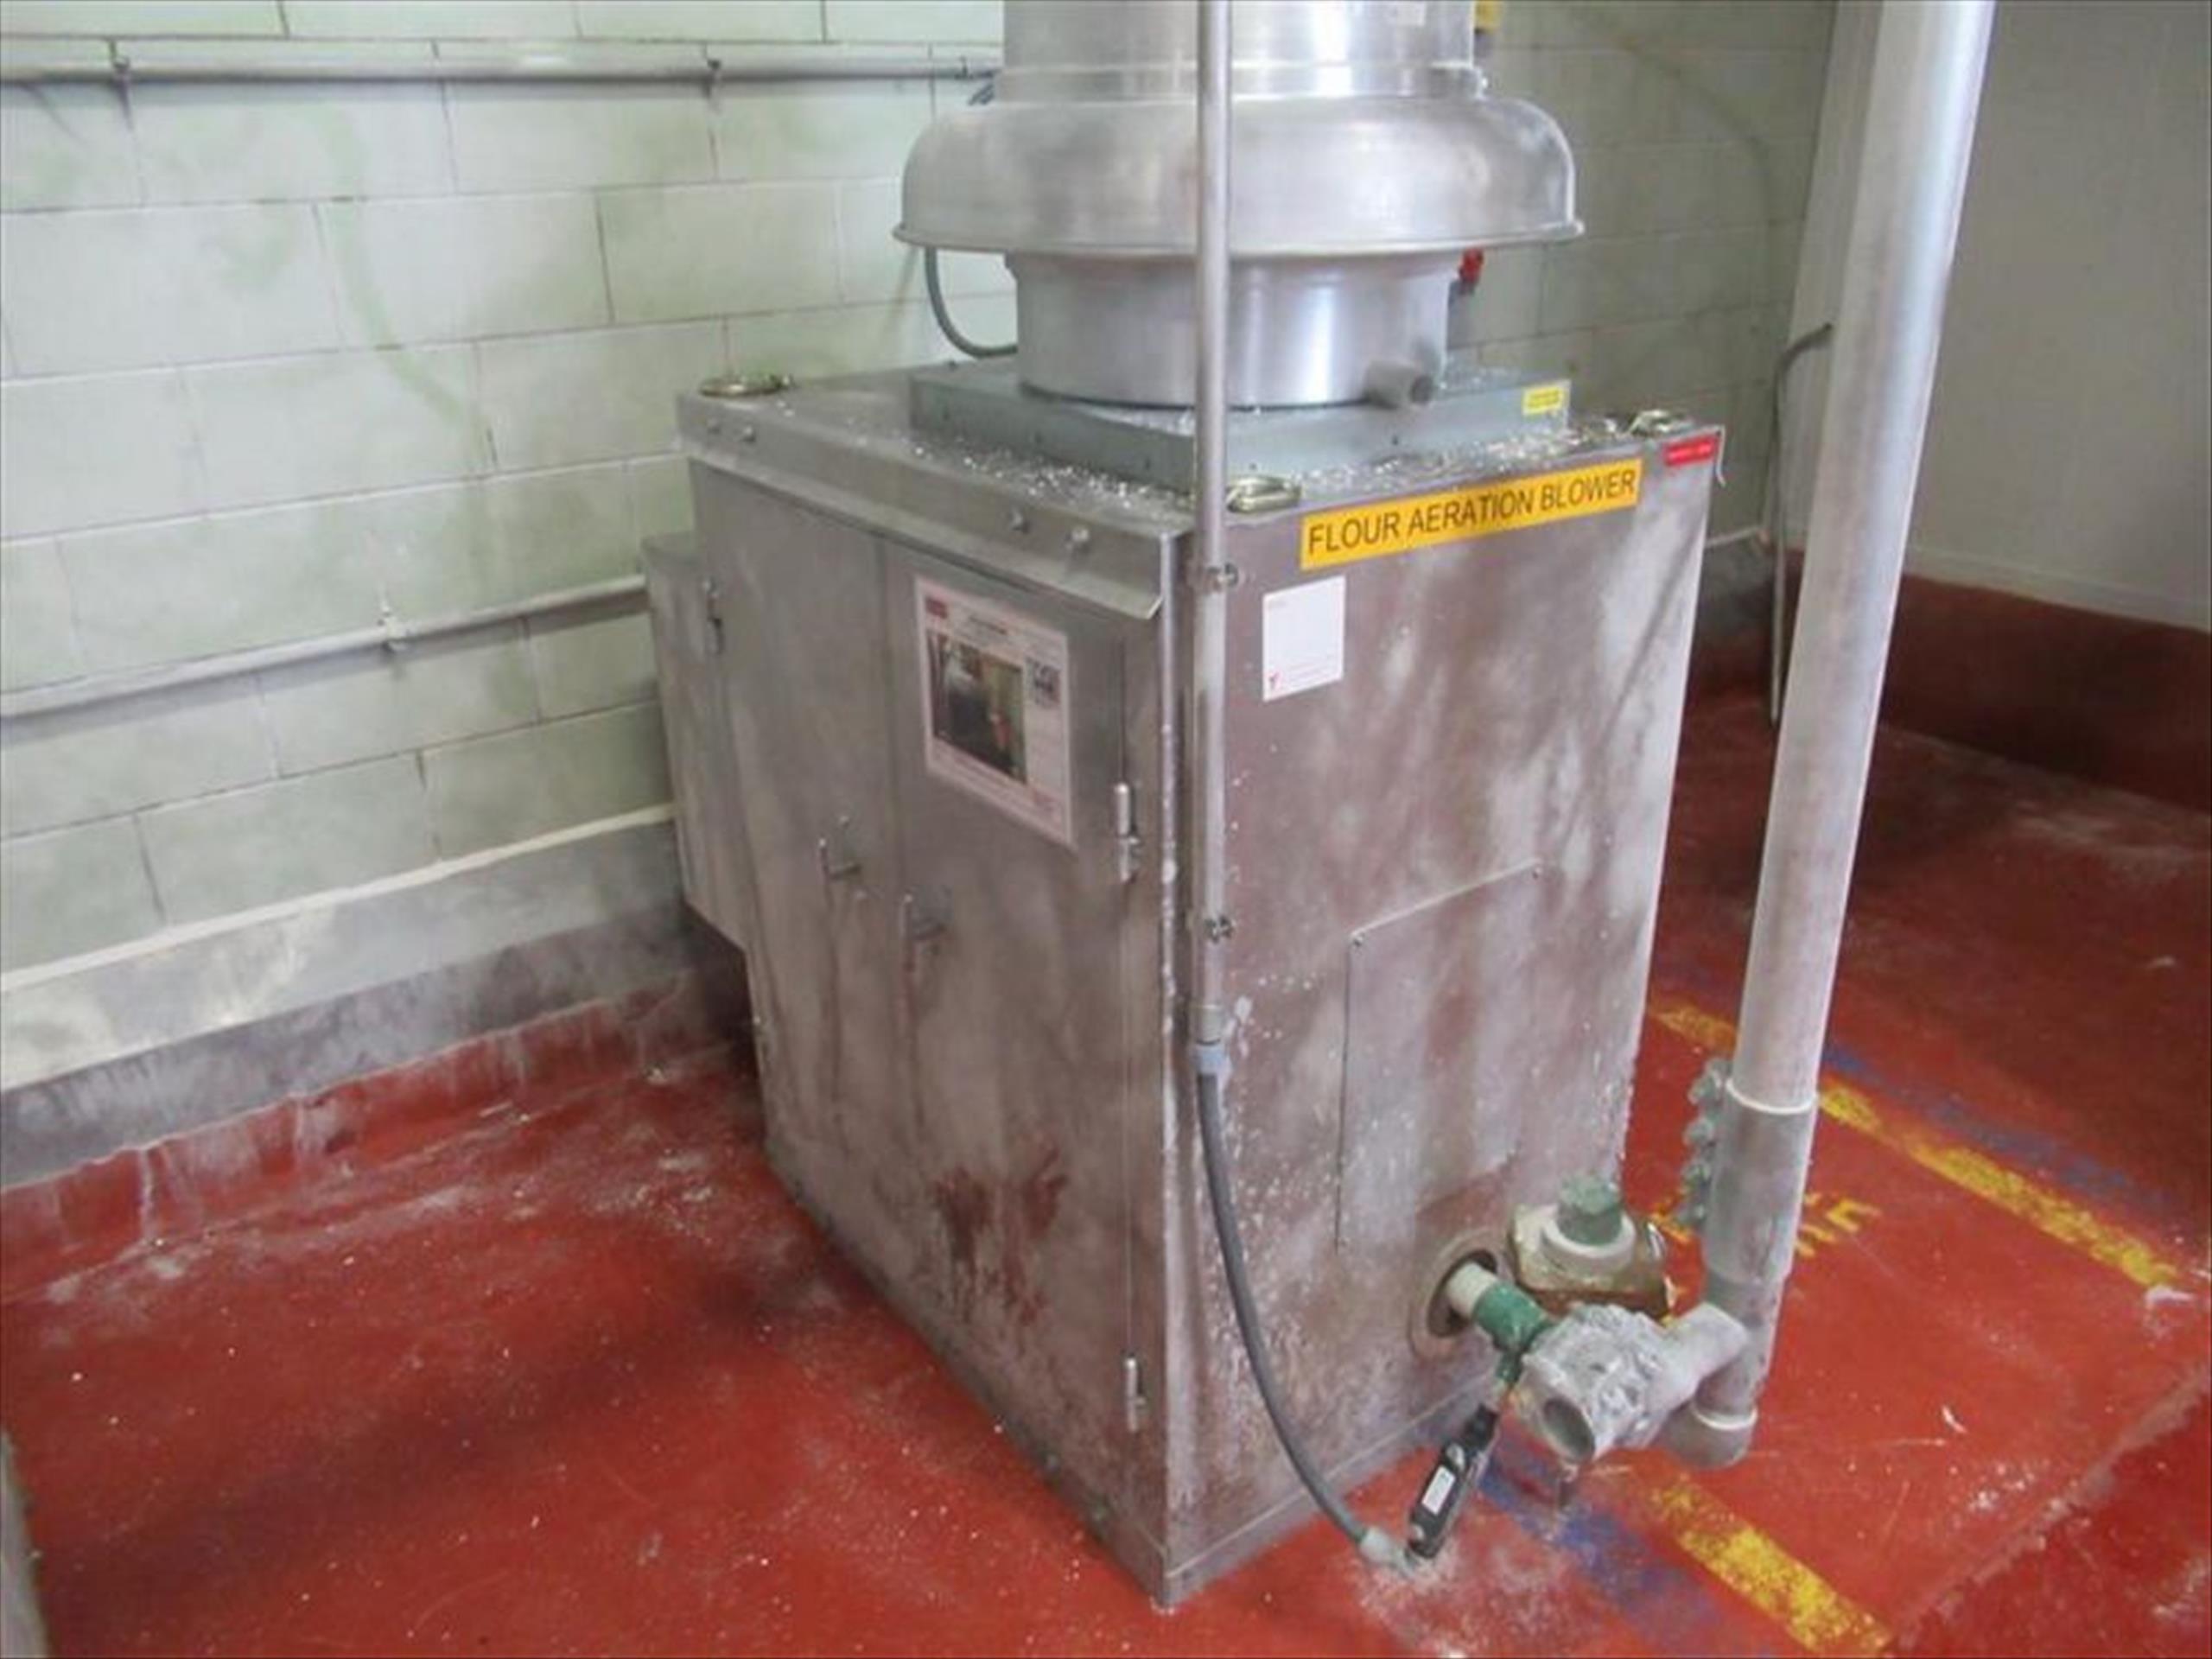 Dresser Roots Flour aeration blower mod. no. 33-U-RAI ser. no. 1204950981 rotary lobe positive